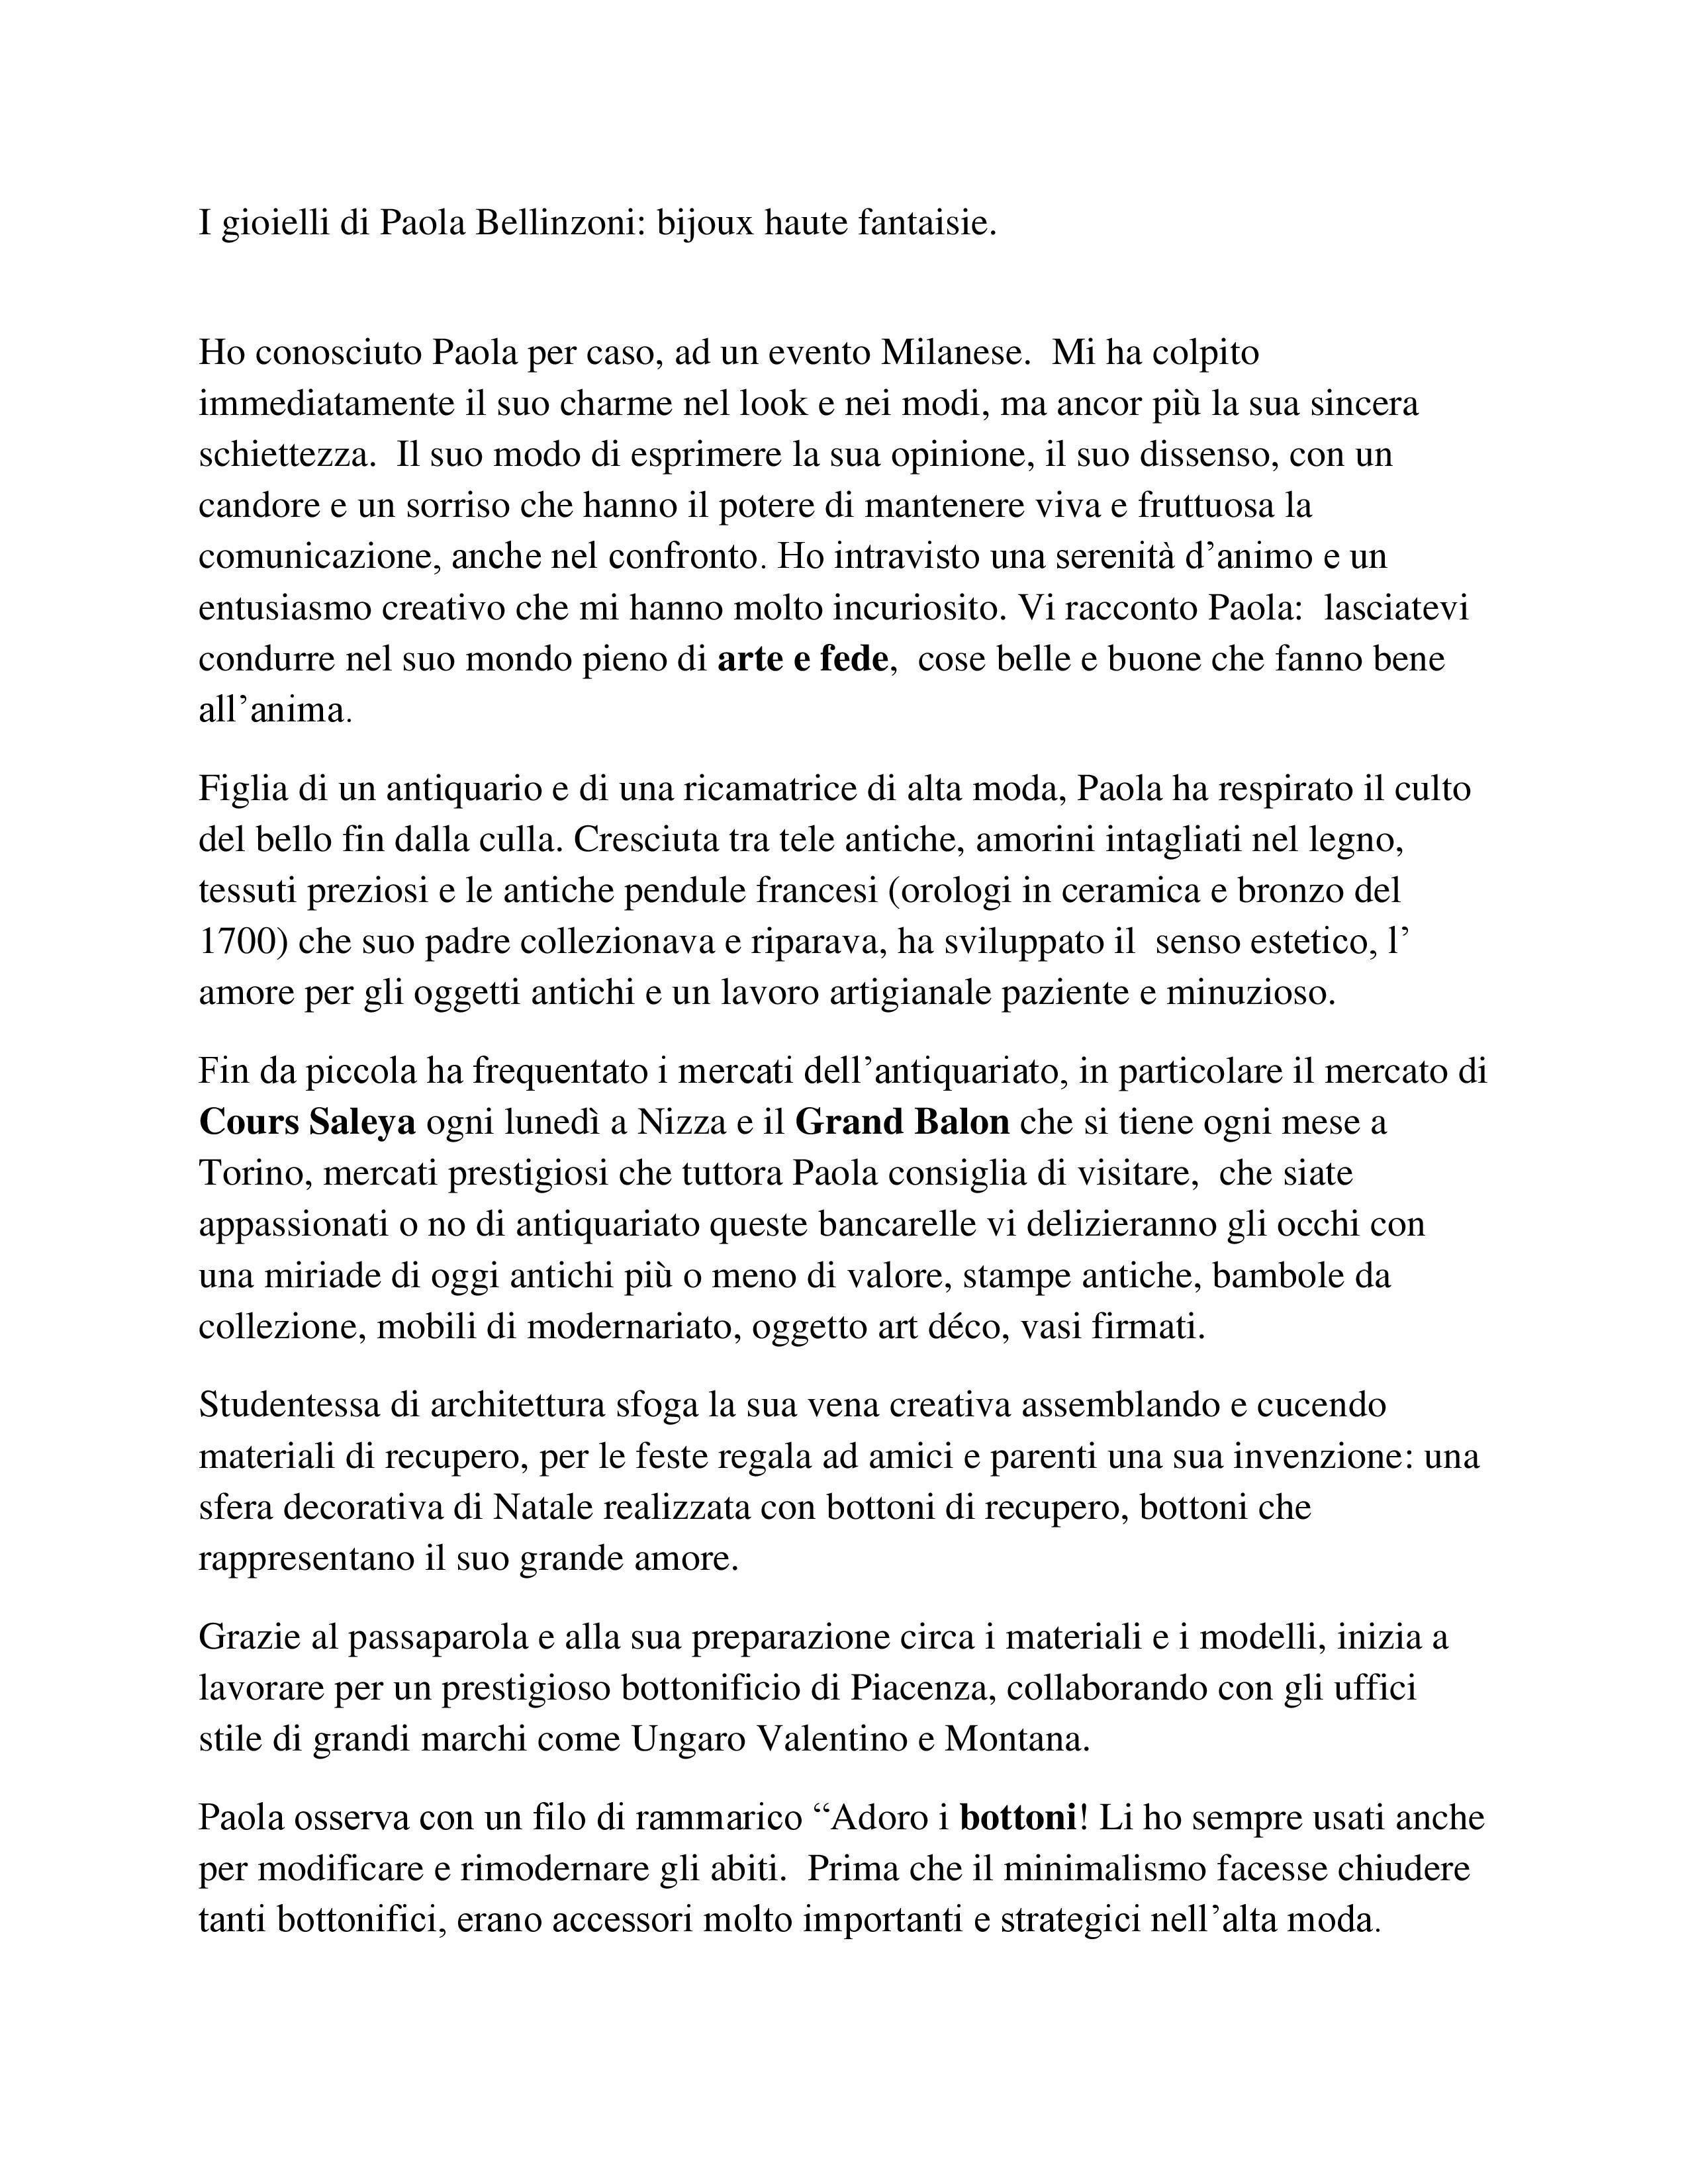 quotidiano mimepaolabellinzonibysusannapirola-page-001jpg